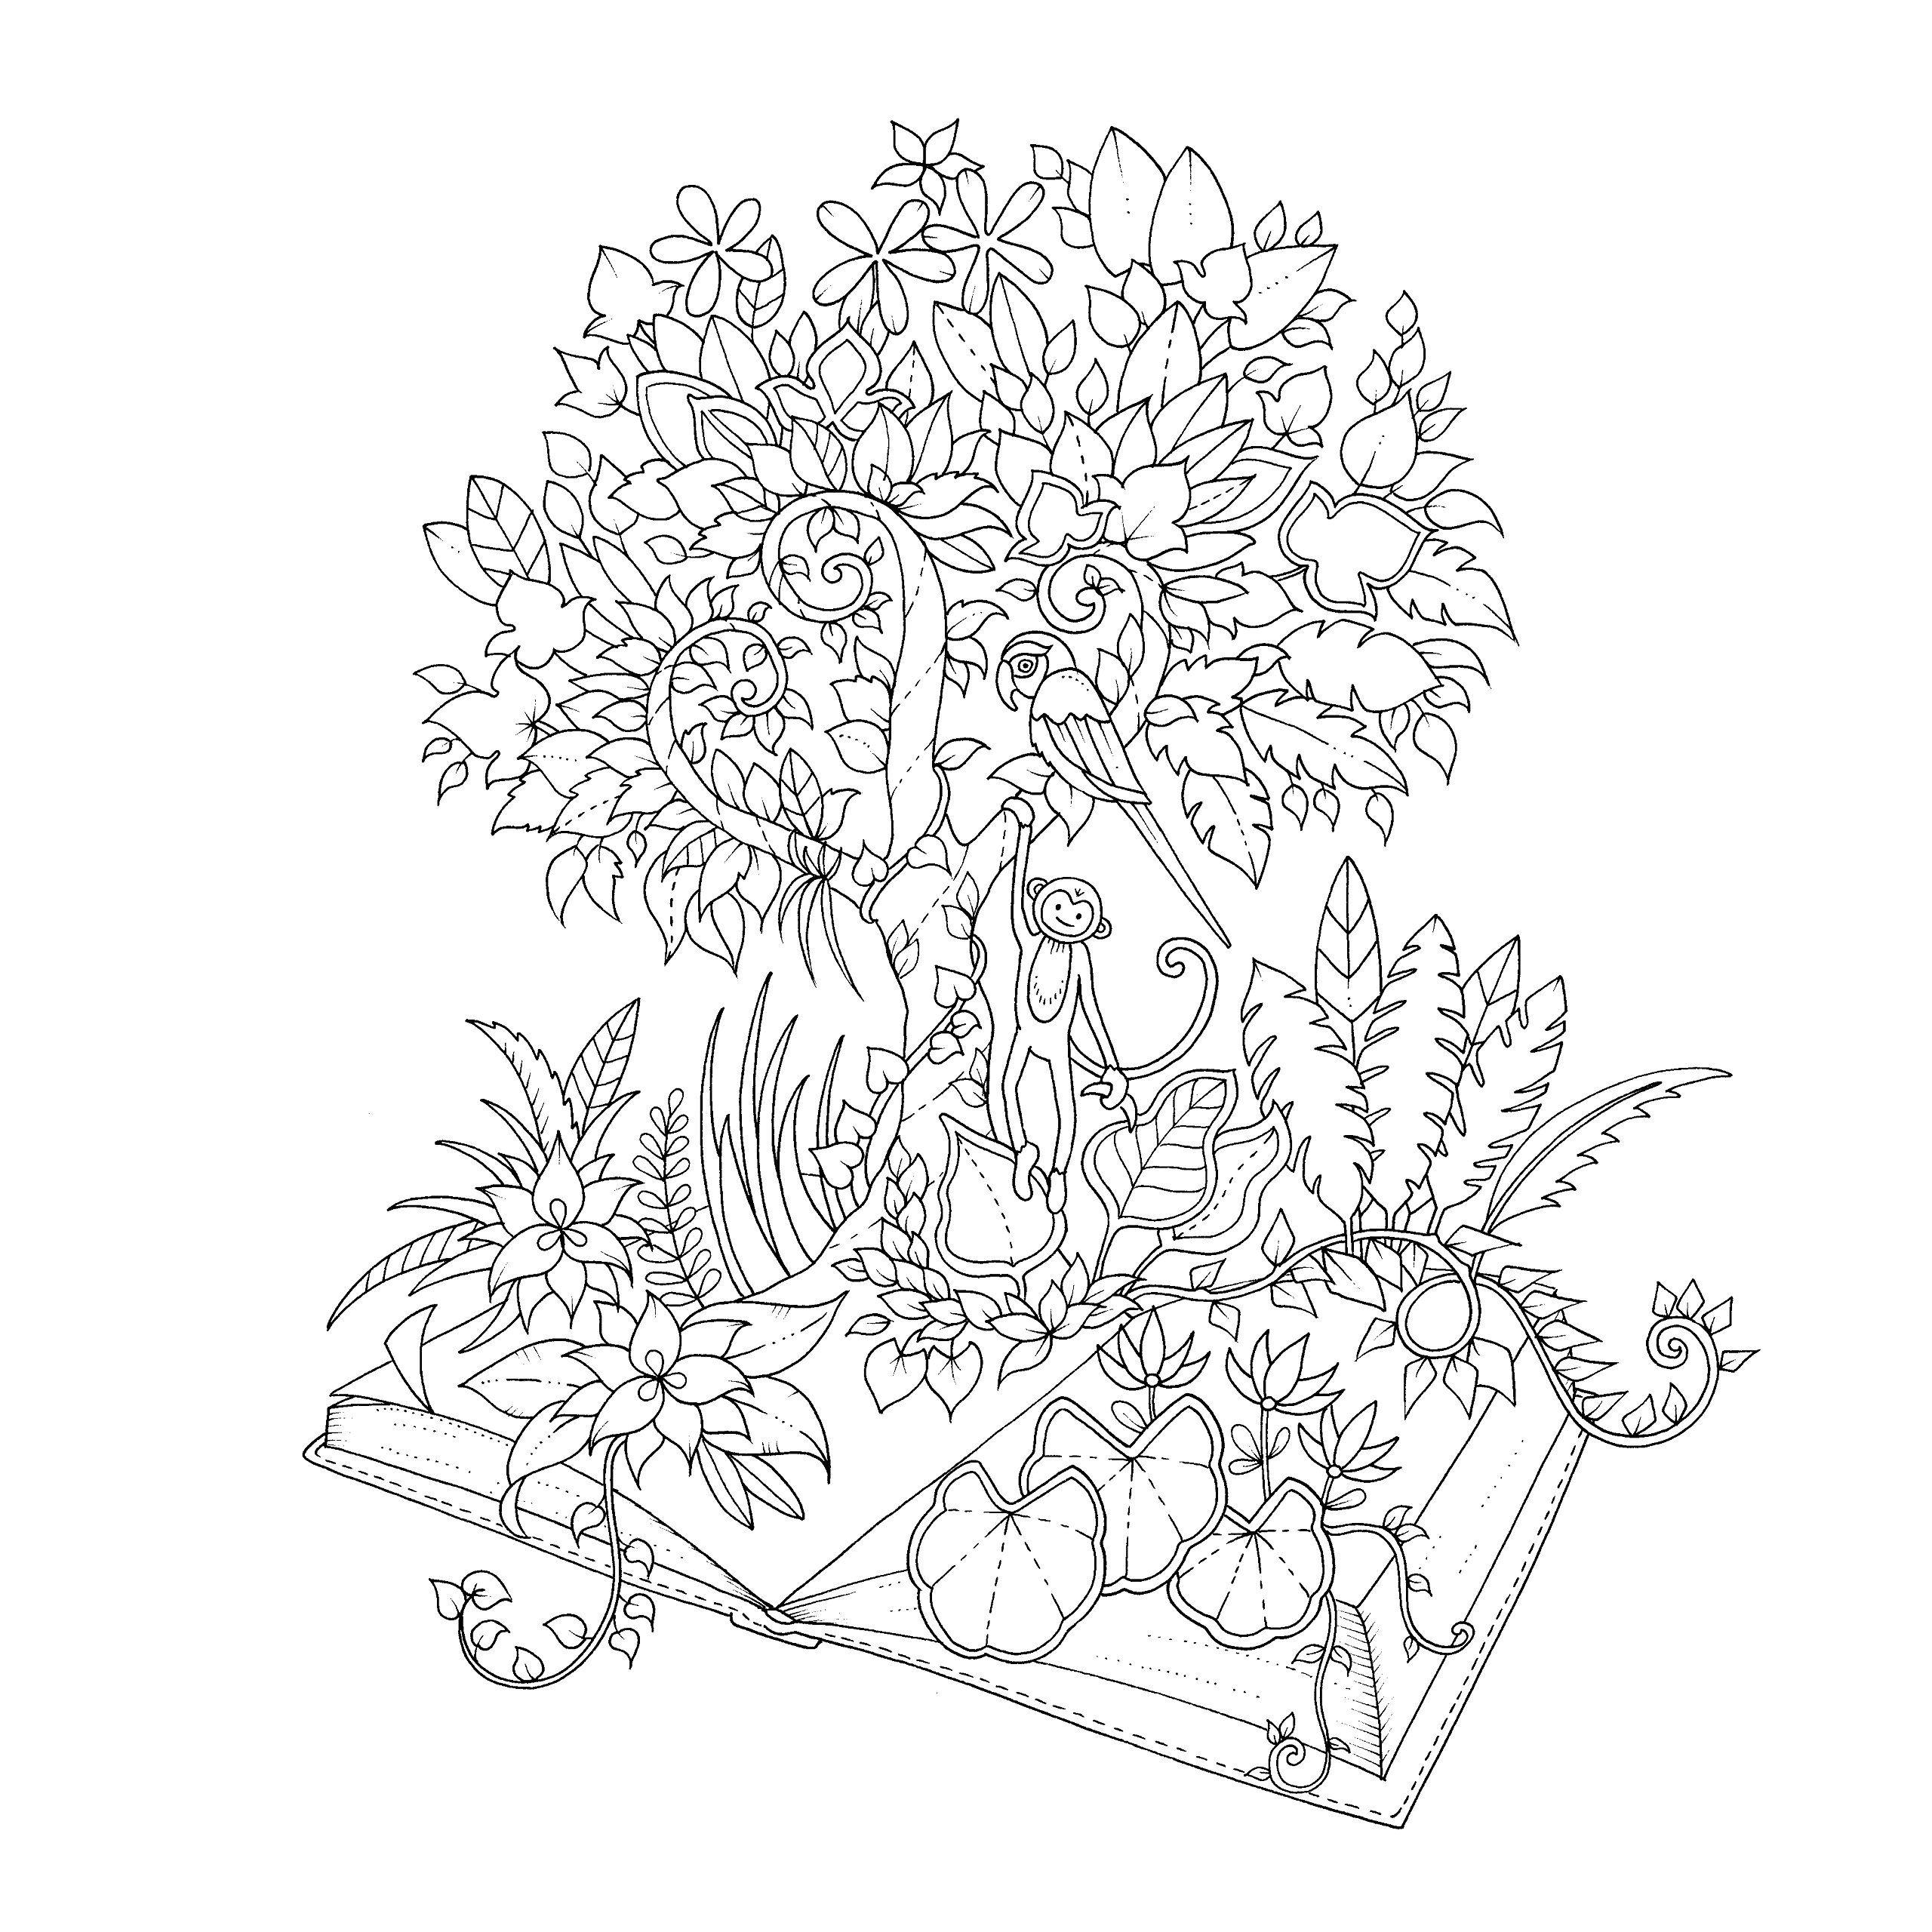 Pin von Mama Mia auf cute coloring book | Pinterest | Ausmalbilder ...